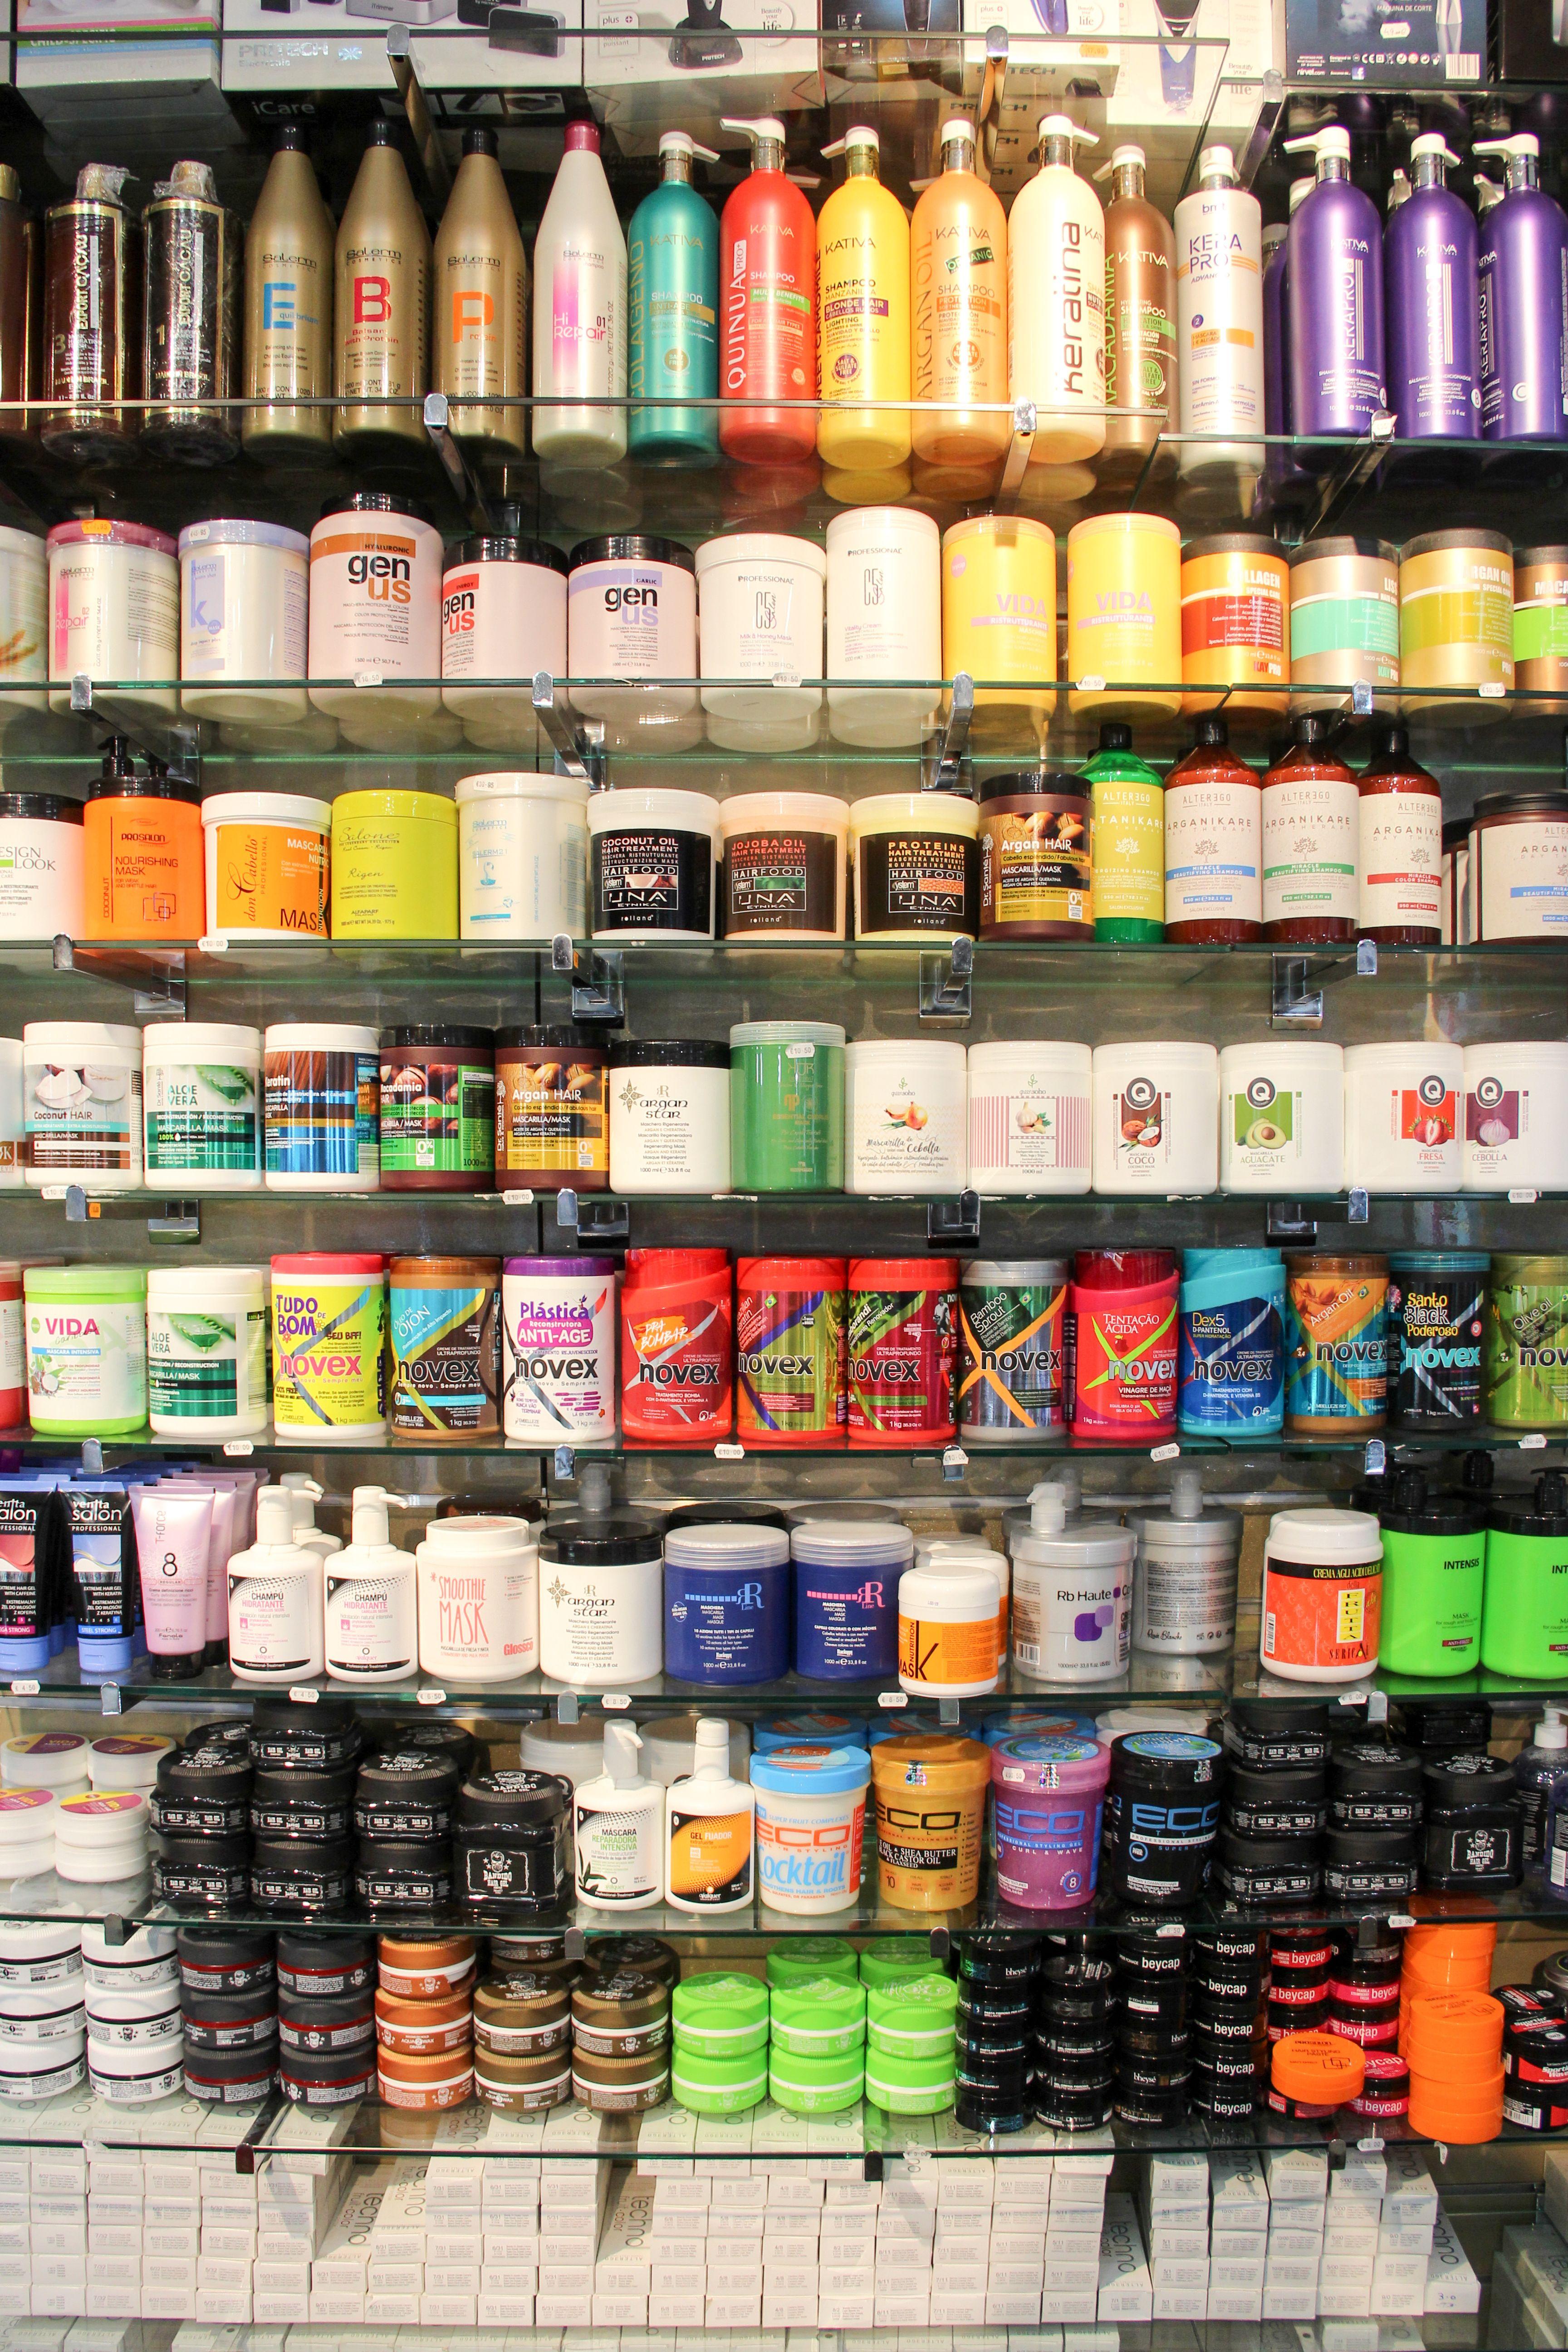 Expositor de productos capilares